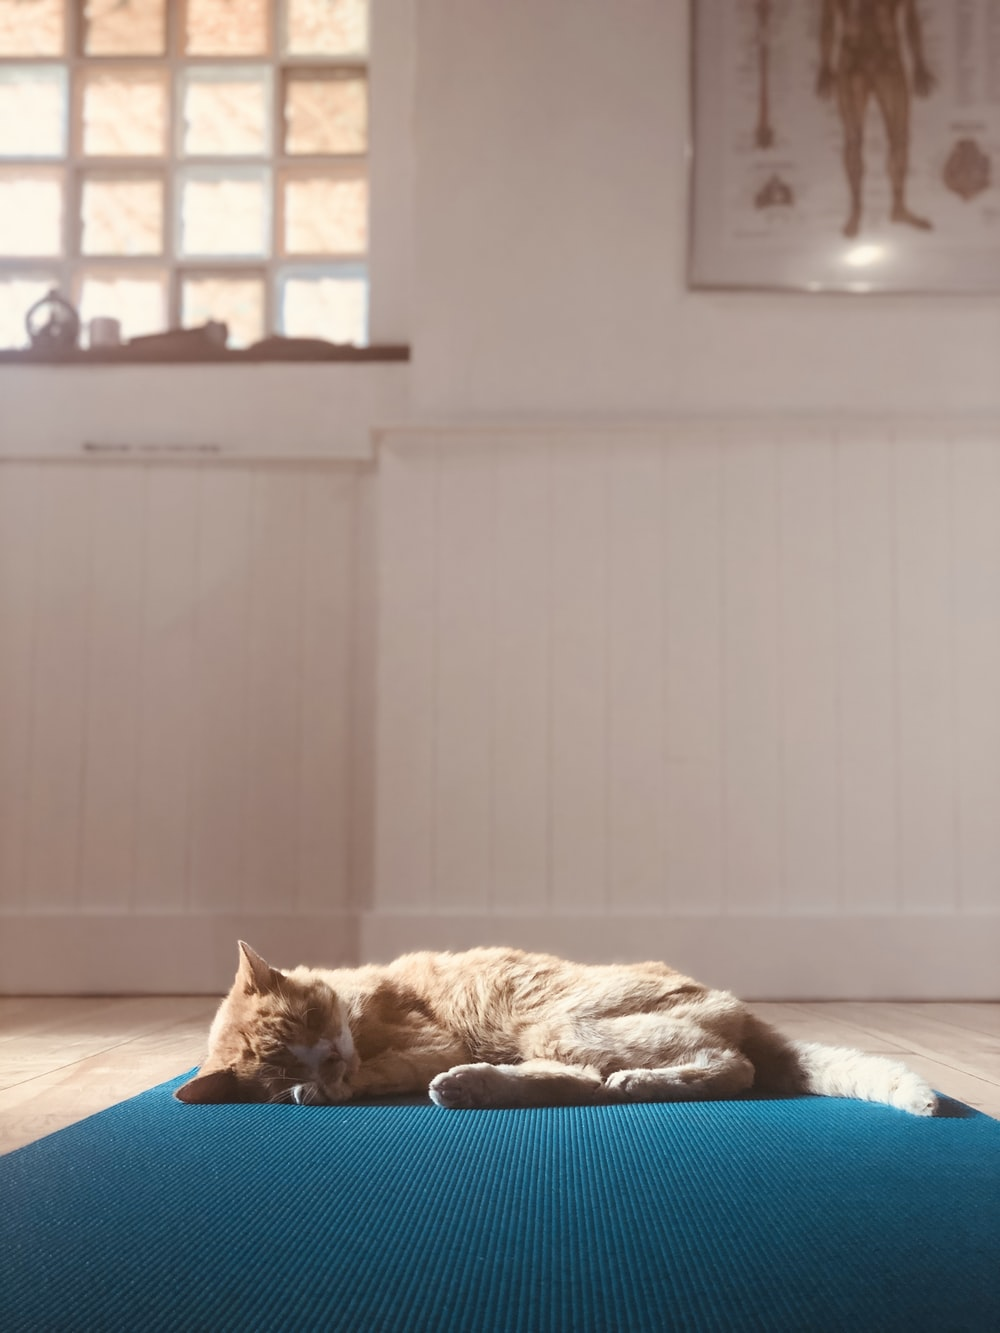 orange tabby cat lying on blue bed